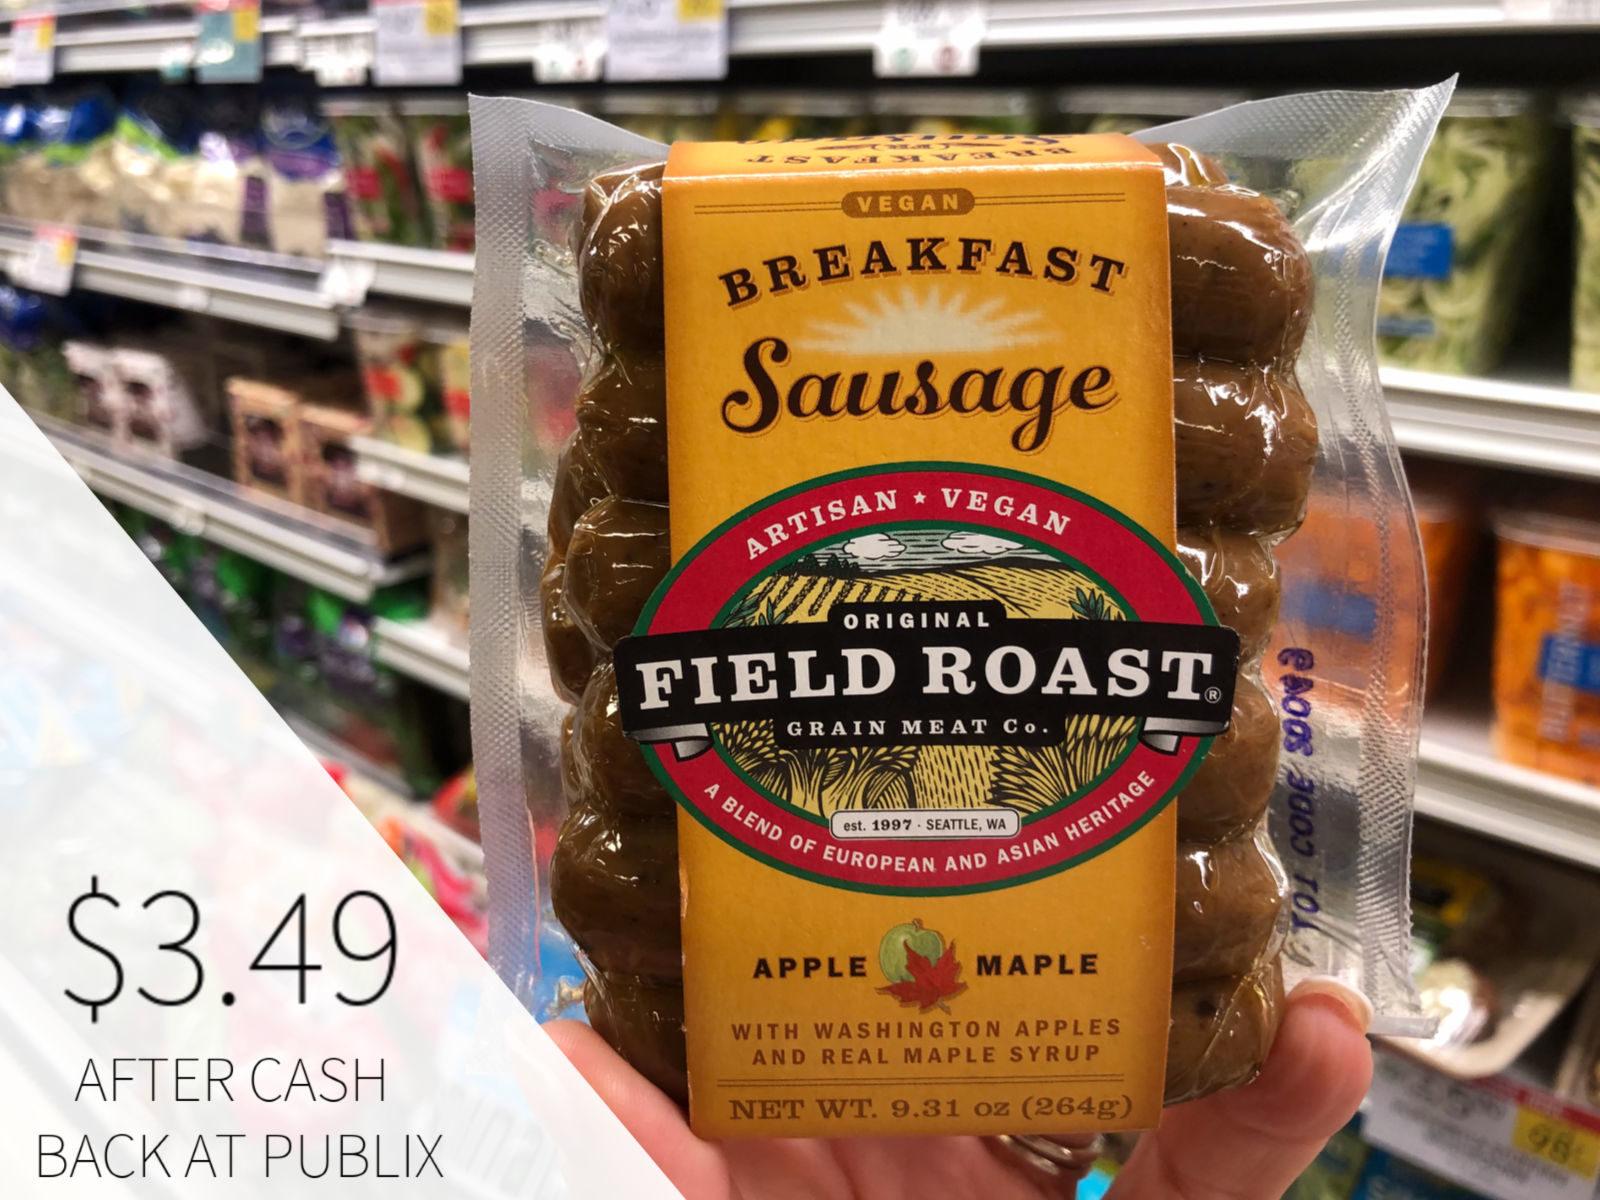 Field Roast Vegetarian Breakfast Sausage Just $3.99 At Publix (Save $2!) on I Heart Publix